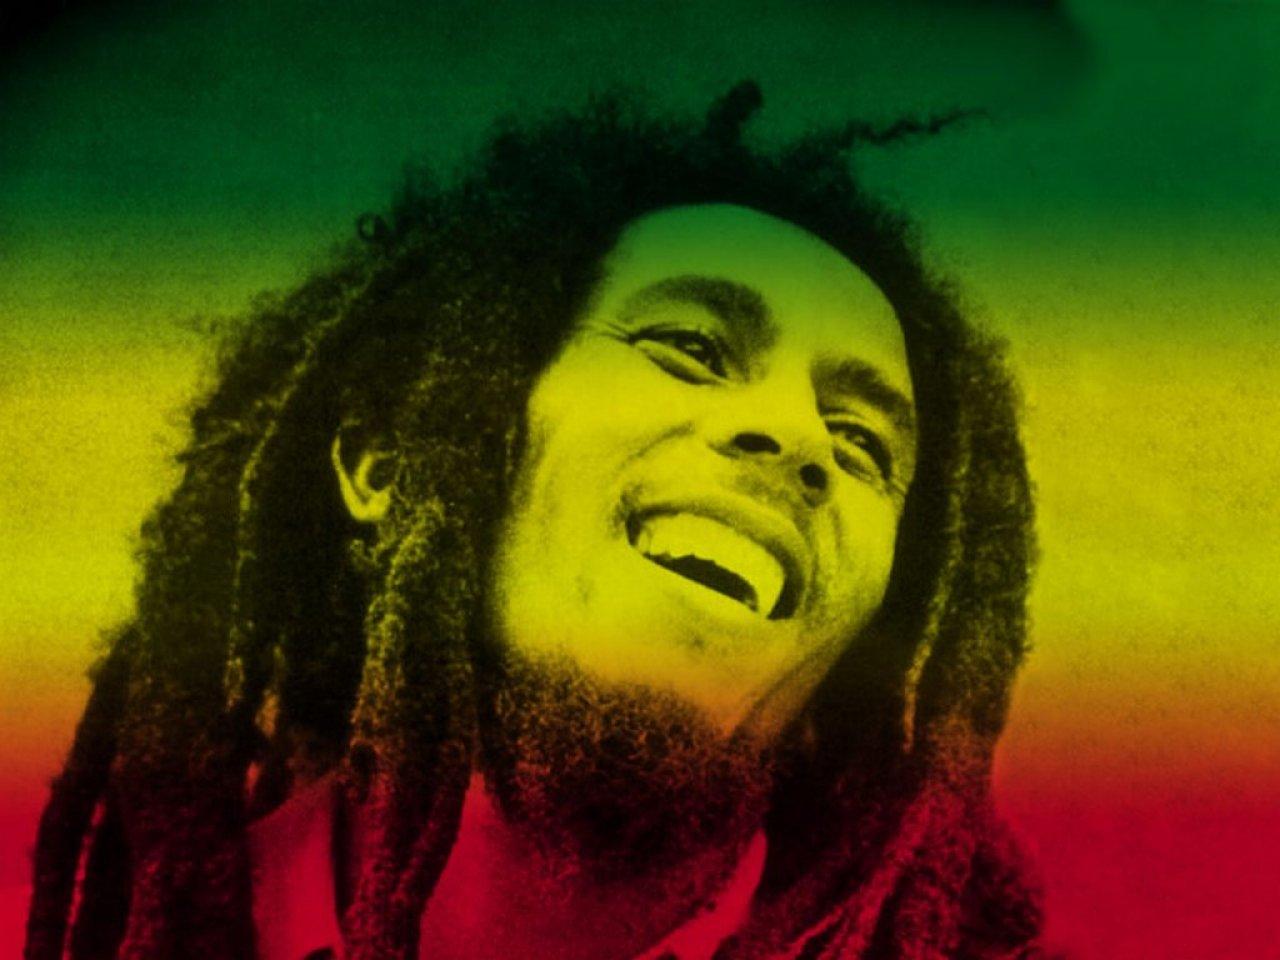 http://1.bp.blogspot.com/_kHq5fEB4eog/TGo8hyU5jpI/AAAAAAAABoM/6V1j98LfwQg/s1600/Bob_Marley_wallpaper_picture_image_free_music_Reggae_desktop_wallpaper_1280.jpg